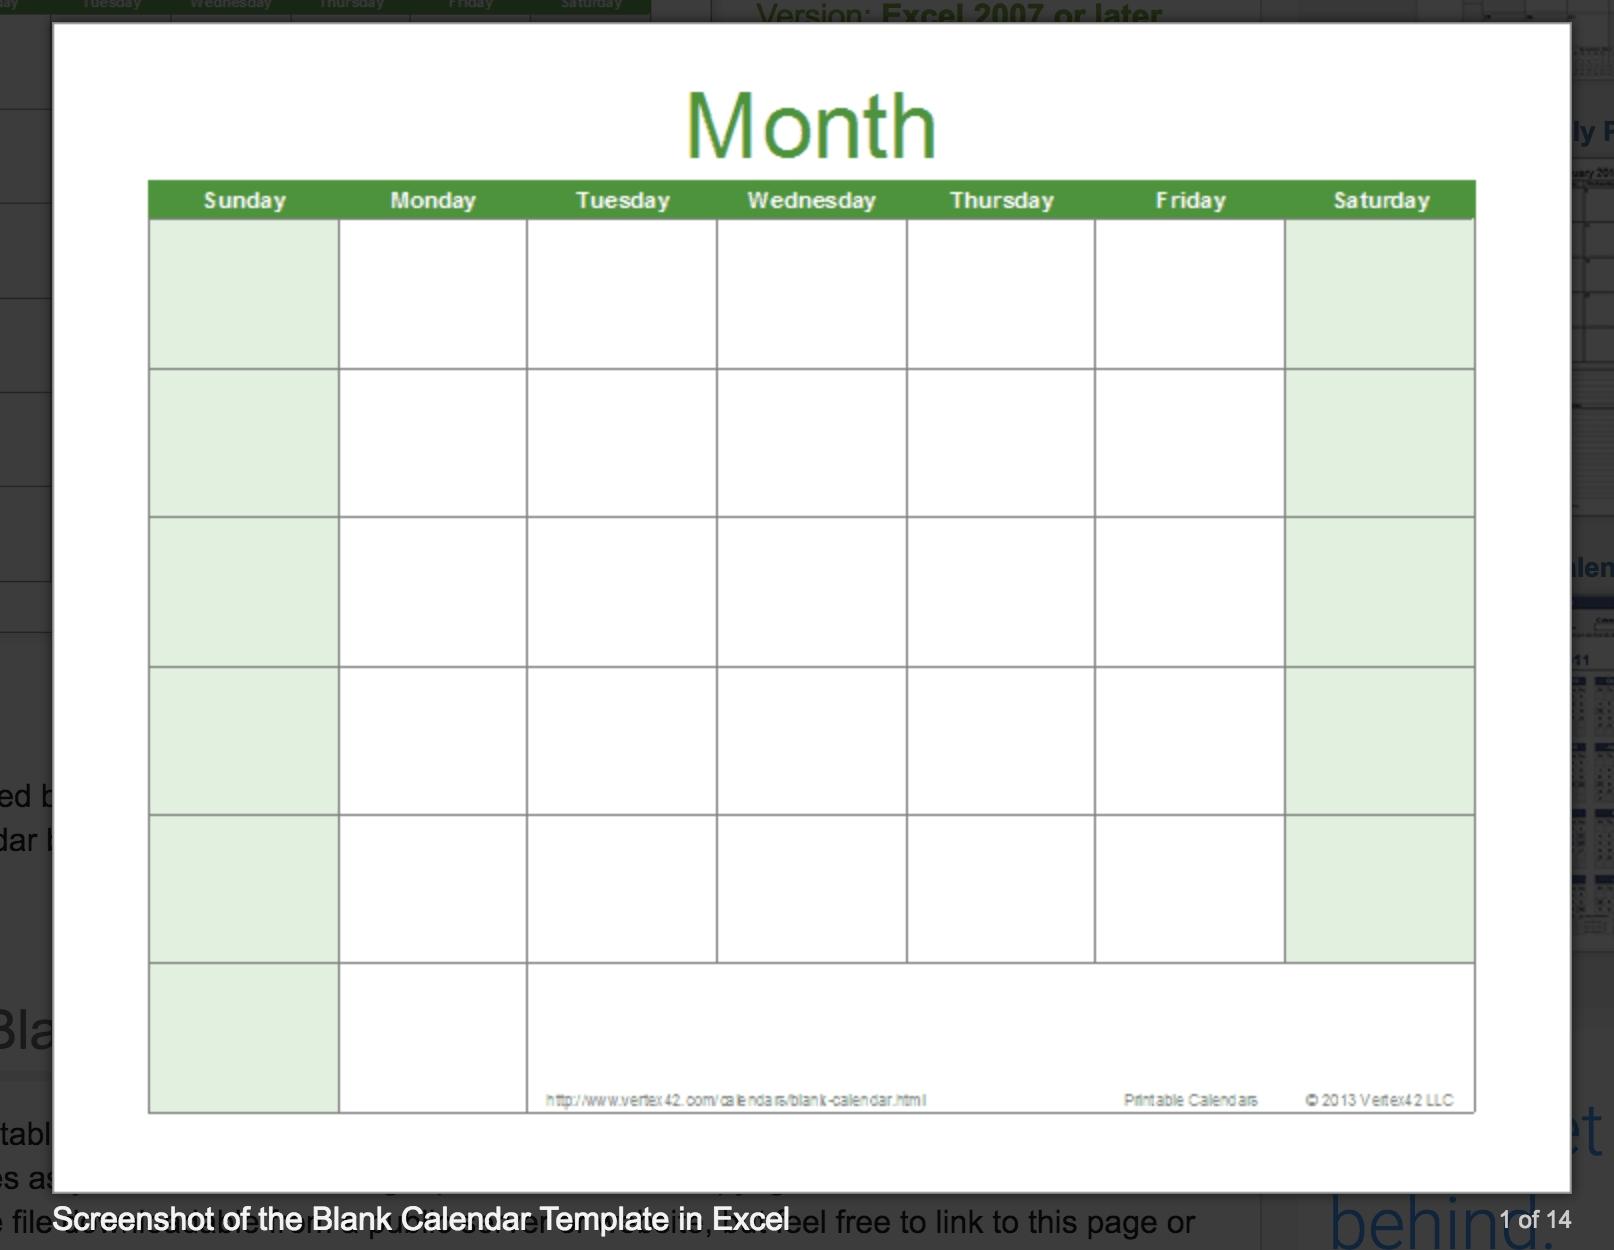 Free Printable Calendar You Can Edit | Month Calendar Printable Calendar You Can Edit